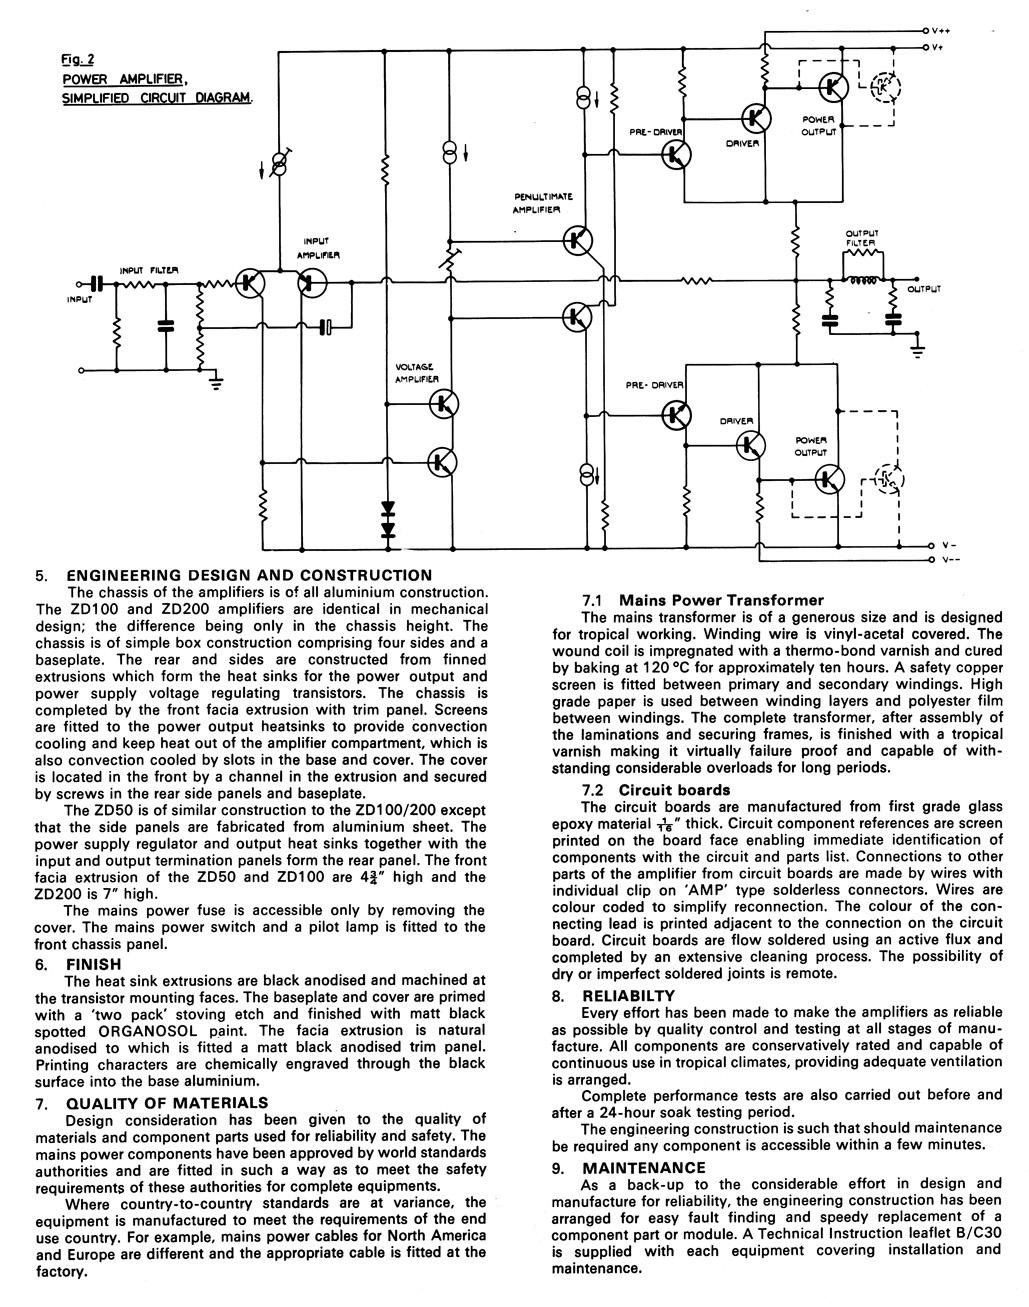 Audio Power Amplifier Design Book Douglas Self Wants Your border=